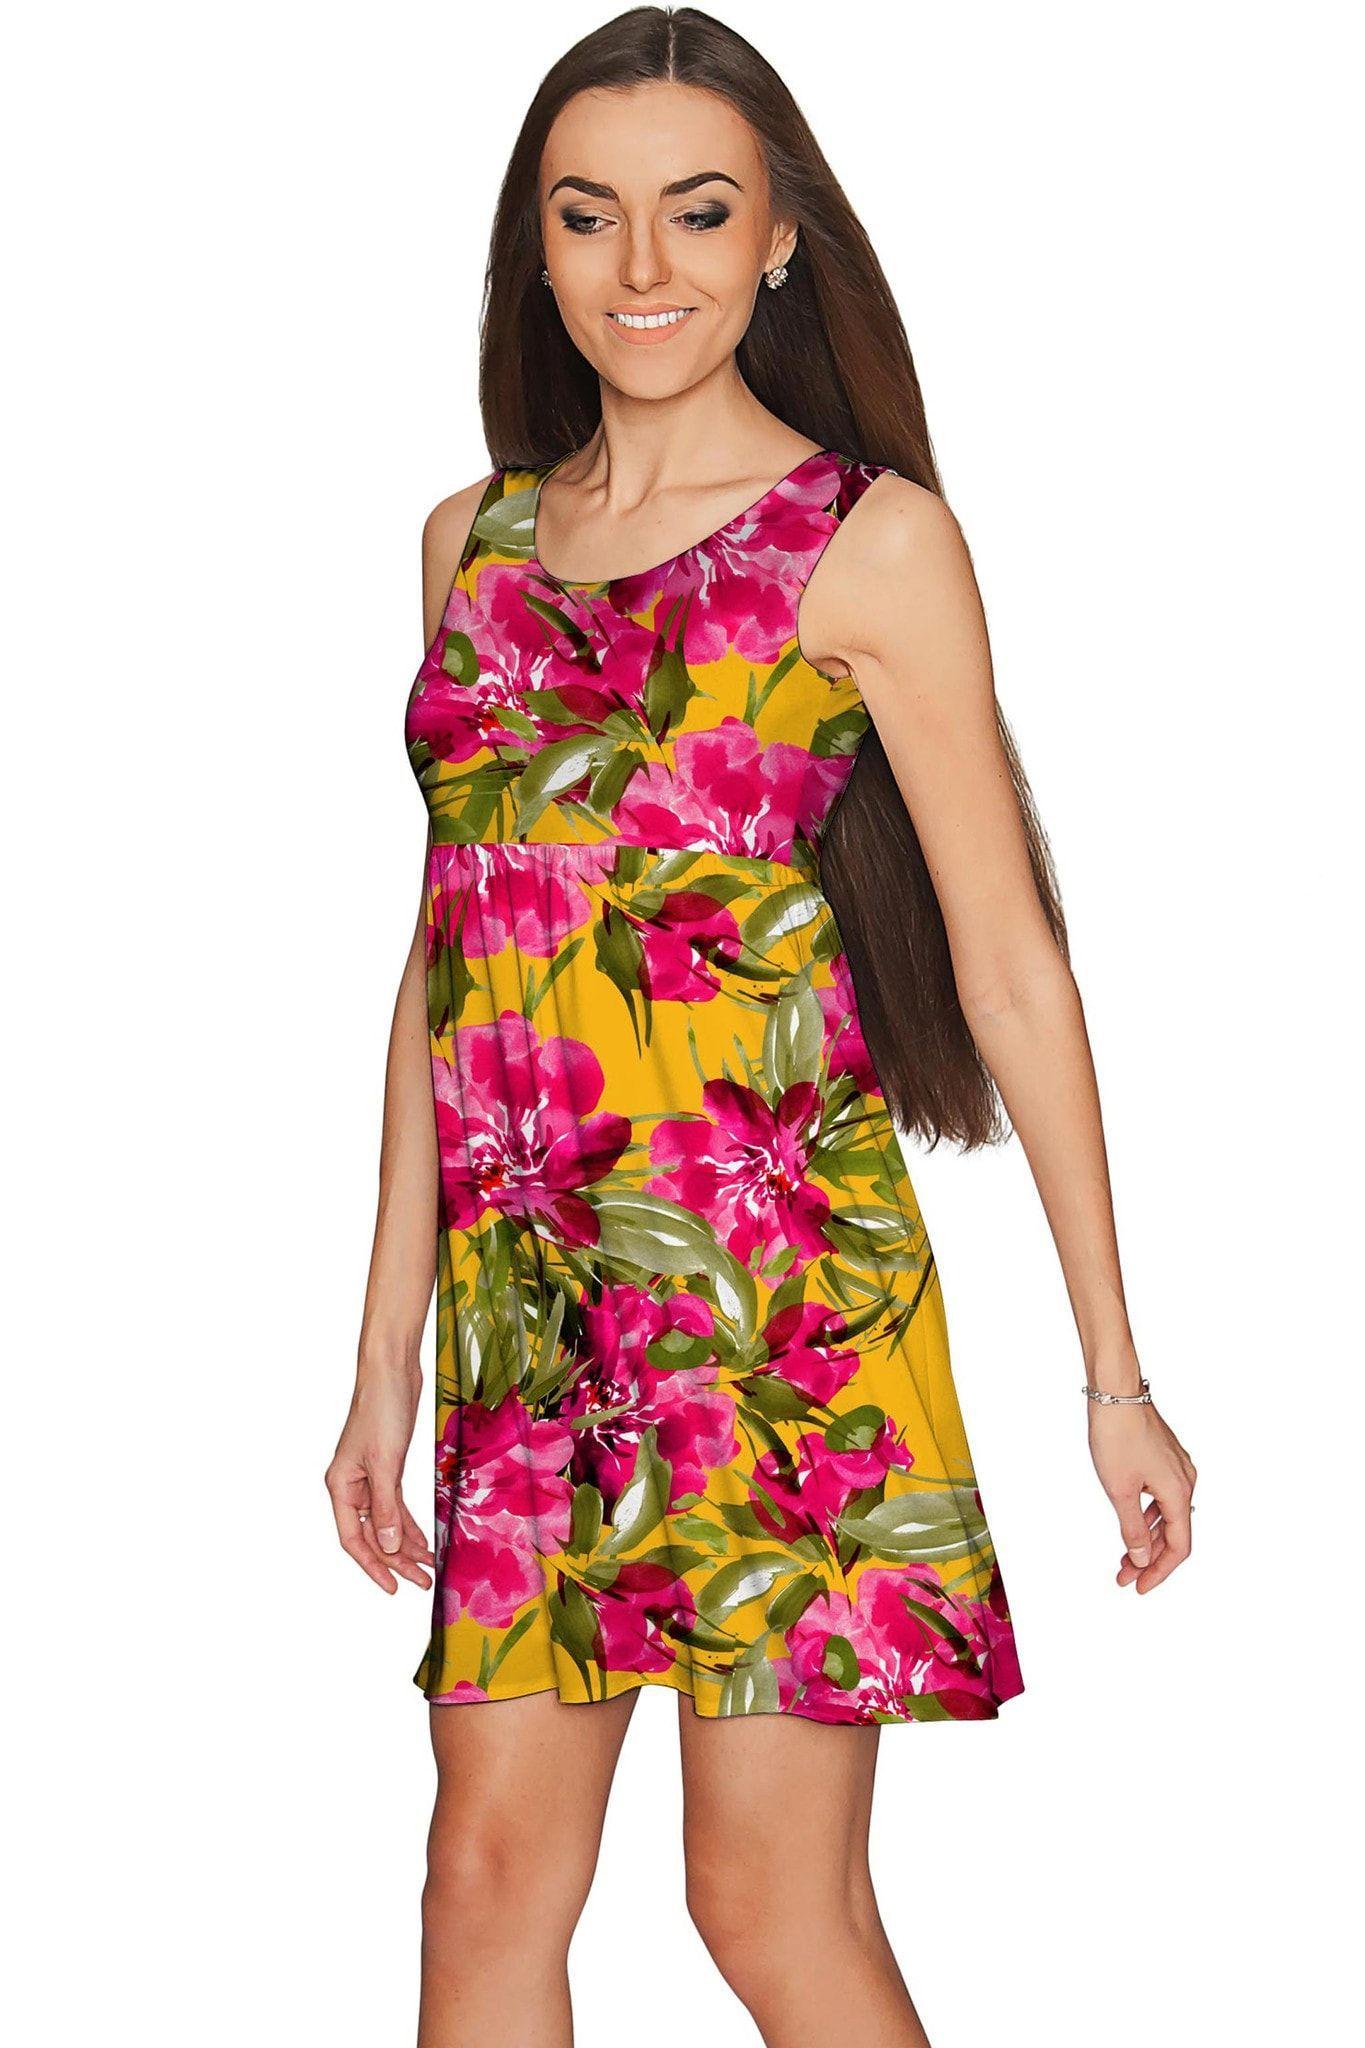 836e10b29f40 Indian Summer Sanibel Pink & Yellow Floral Print Dress - Women ...